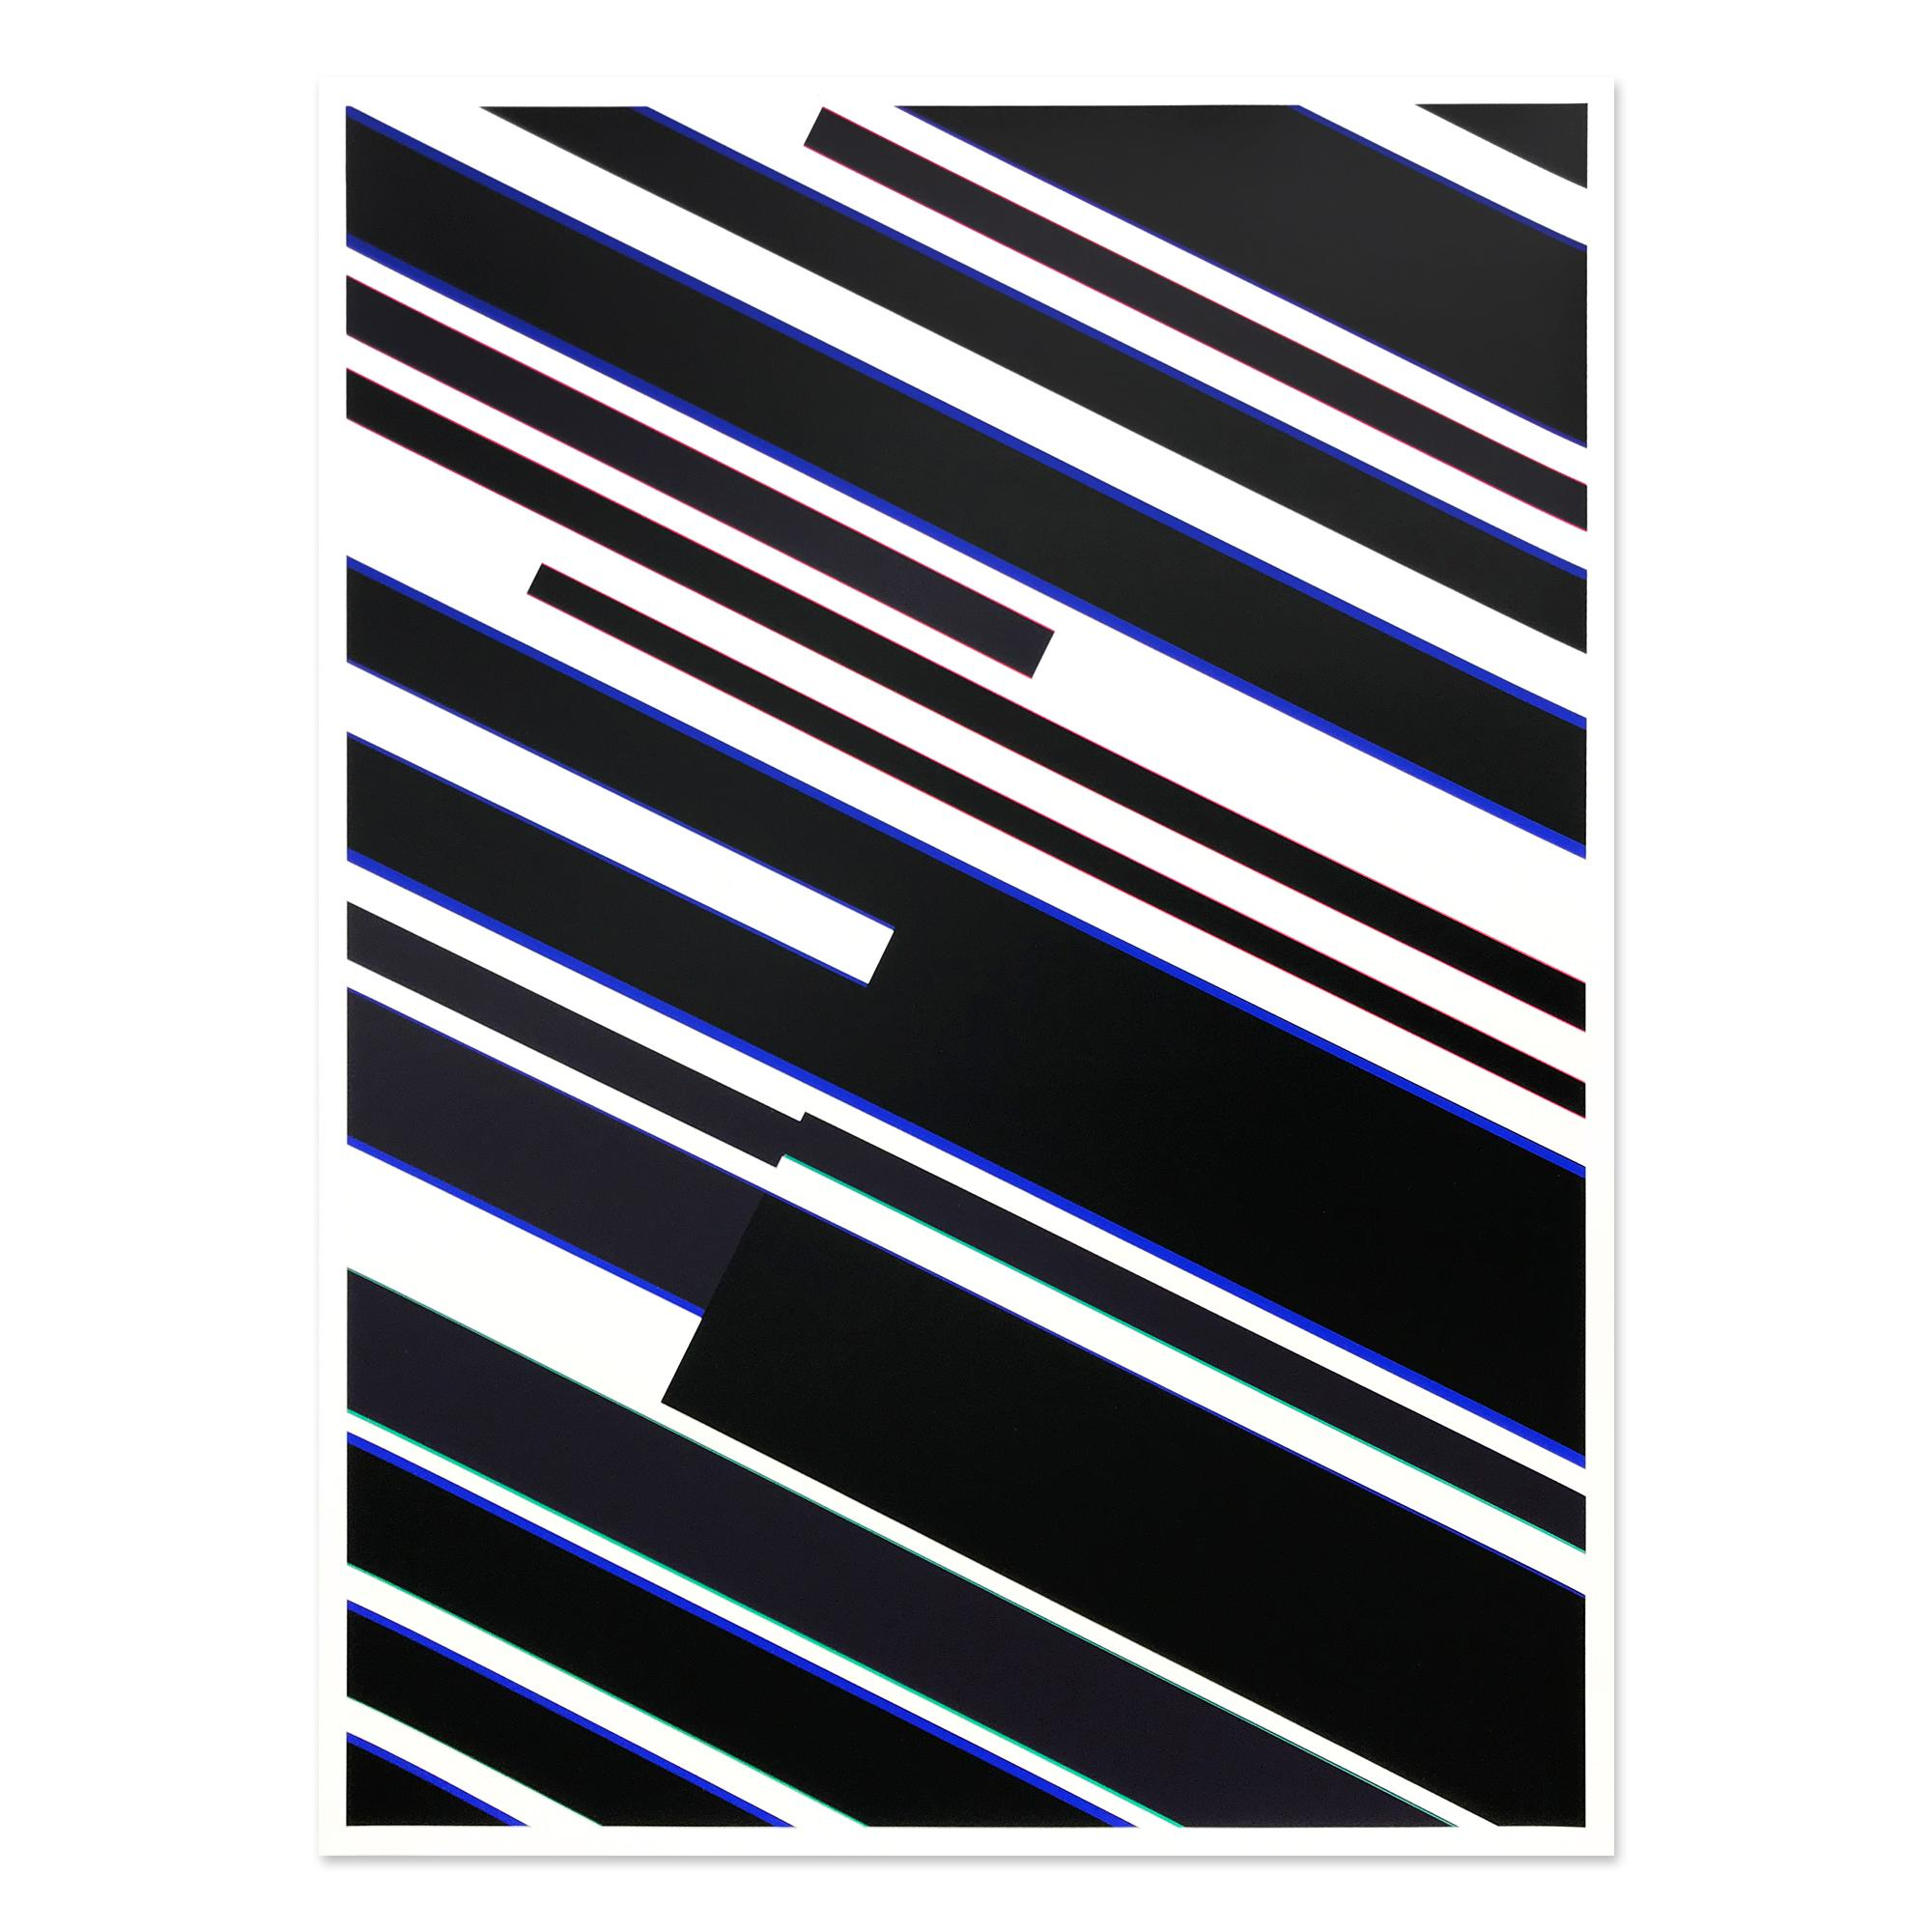 Skansion (from Farbbewegungen), Geometric Abstraction, Constructivism